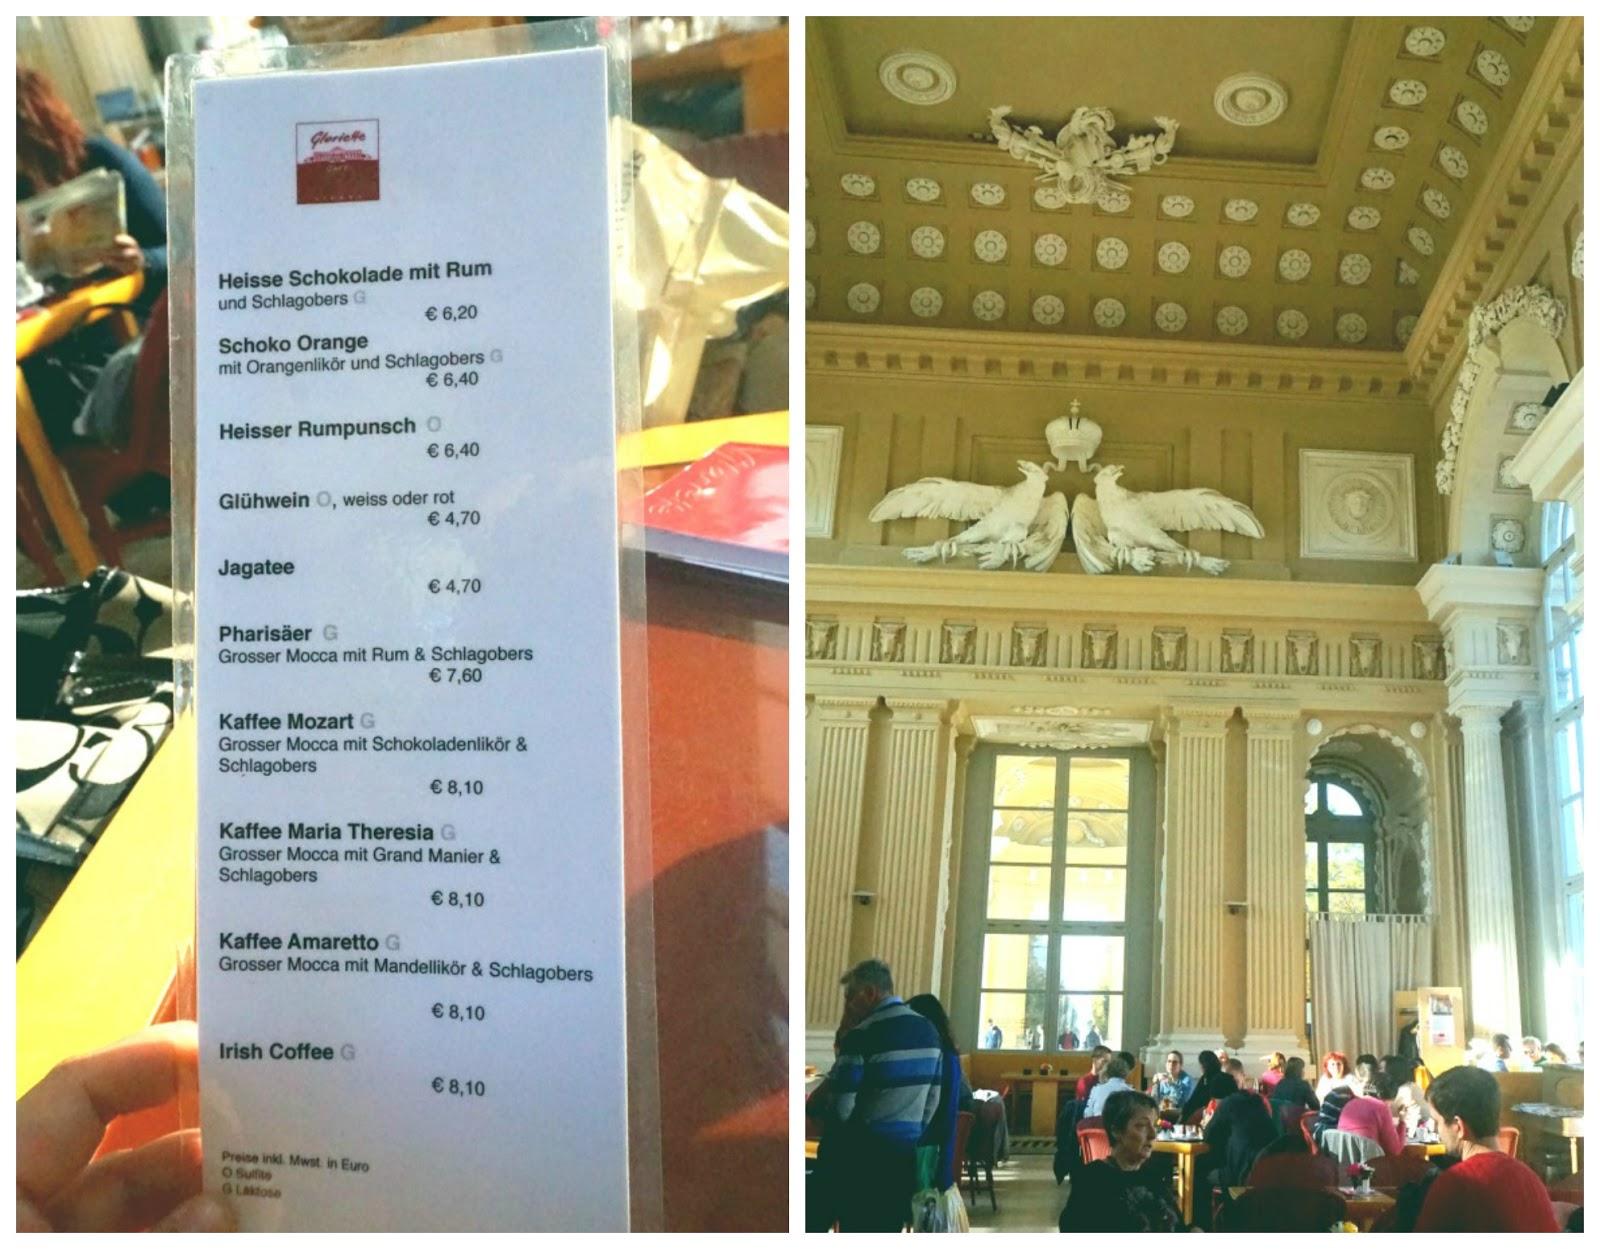 Where to eat in vienna, austria